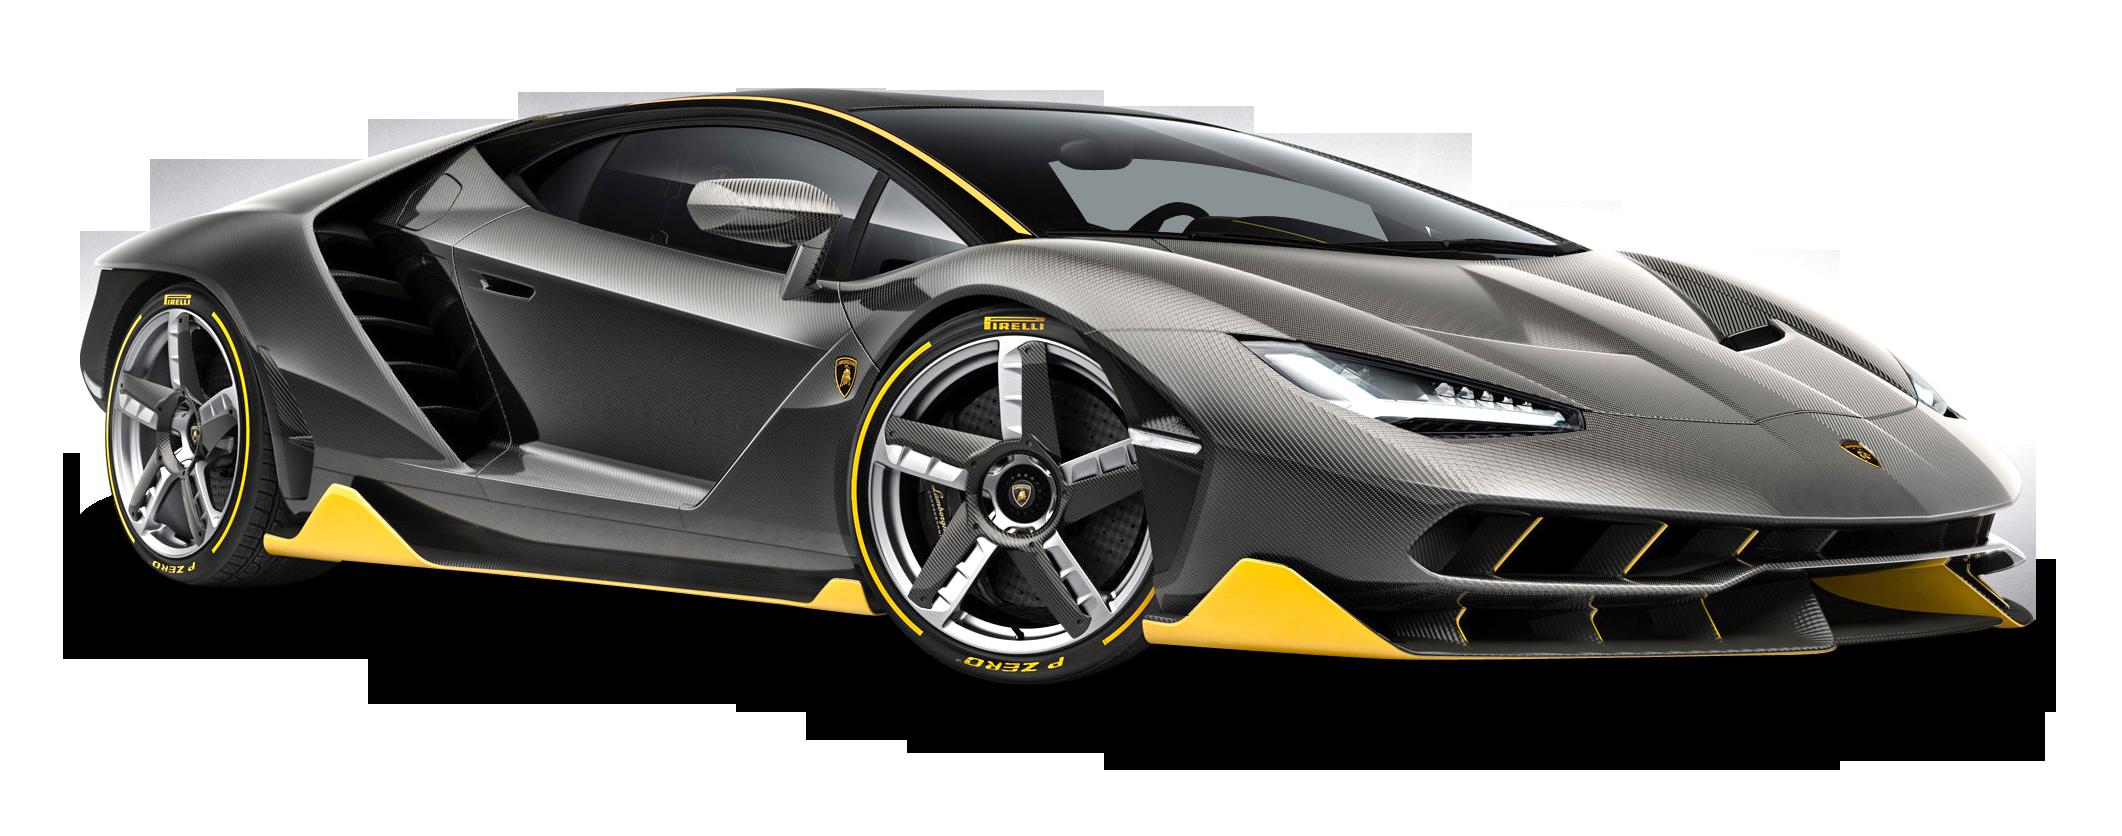 Lamborghini Centenario Lp 770 4 Black Car Png Image Lamborghini Centenario Lamborghini Black Car